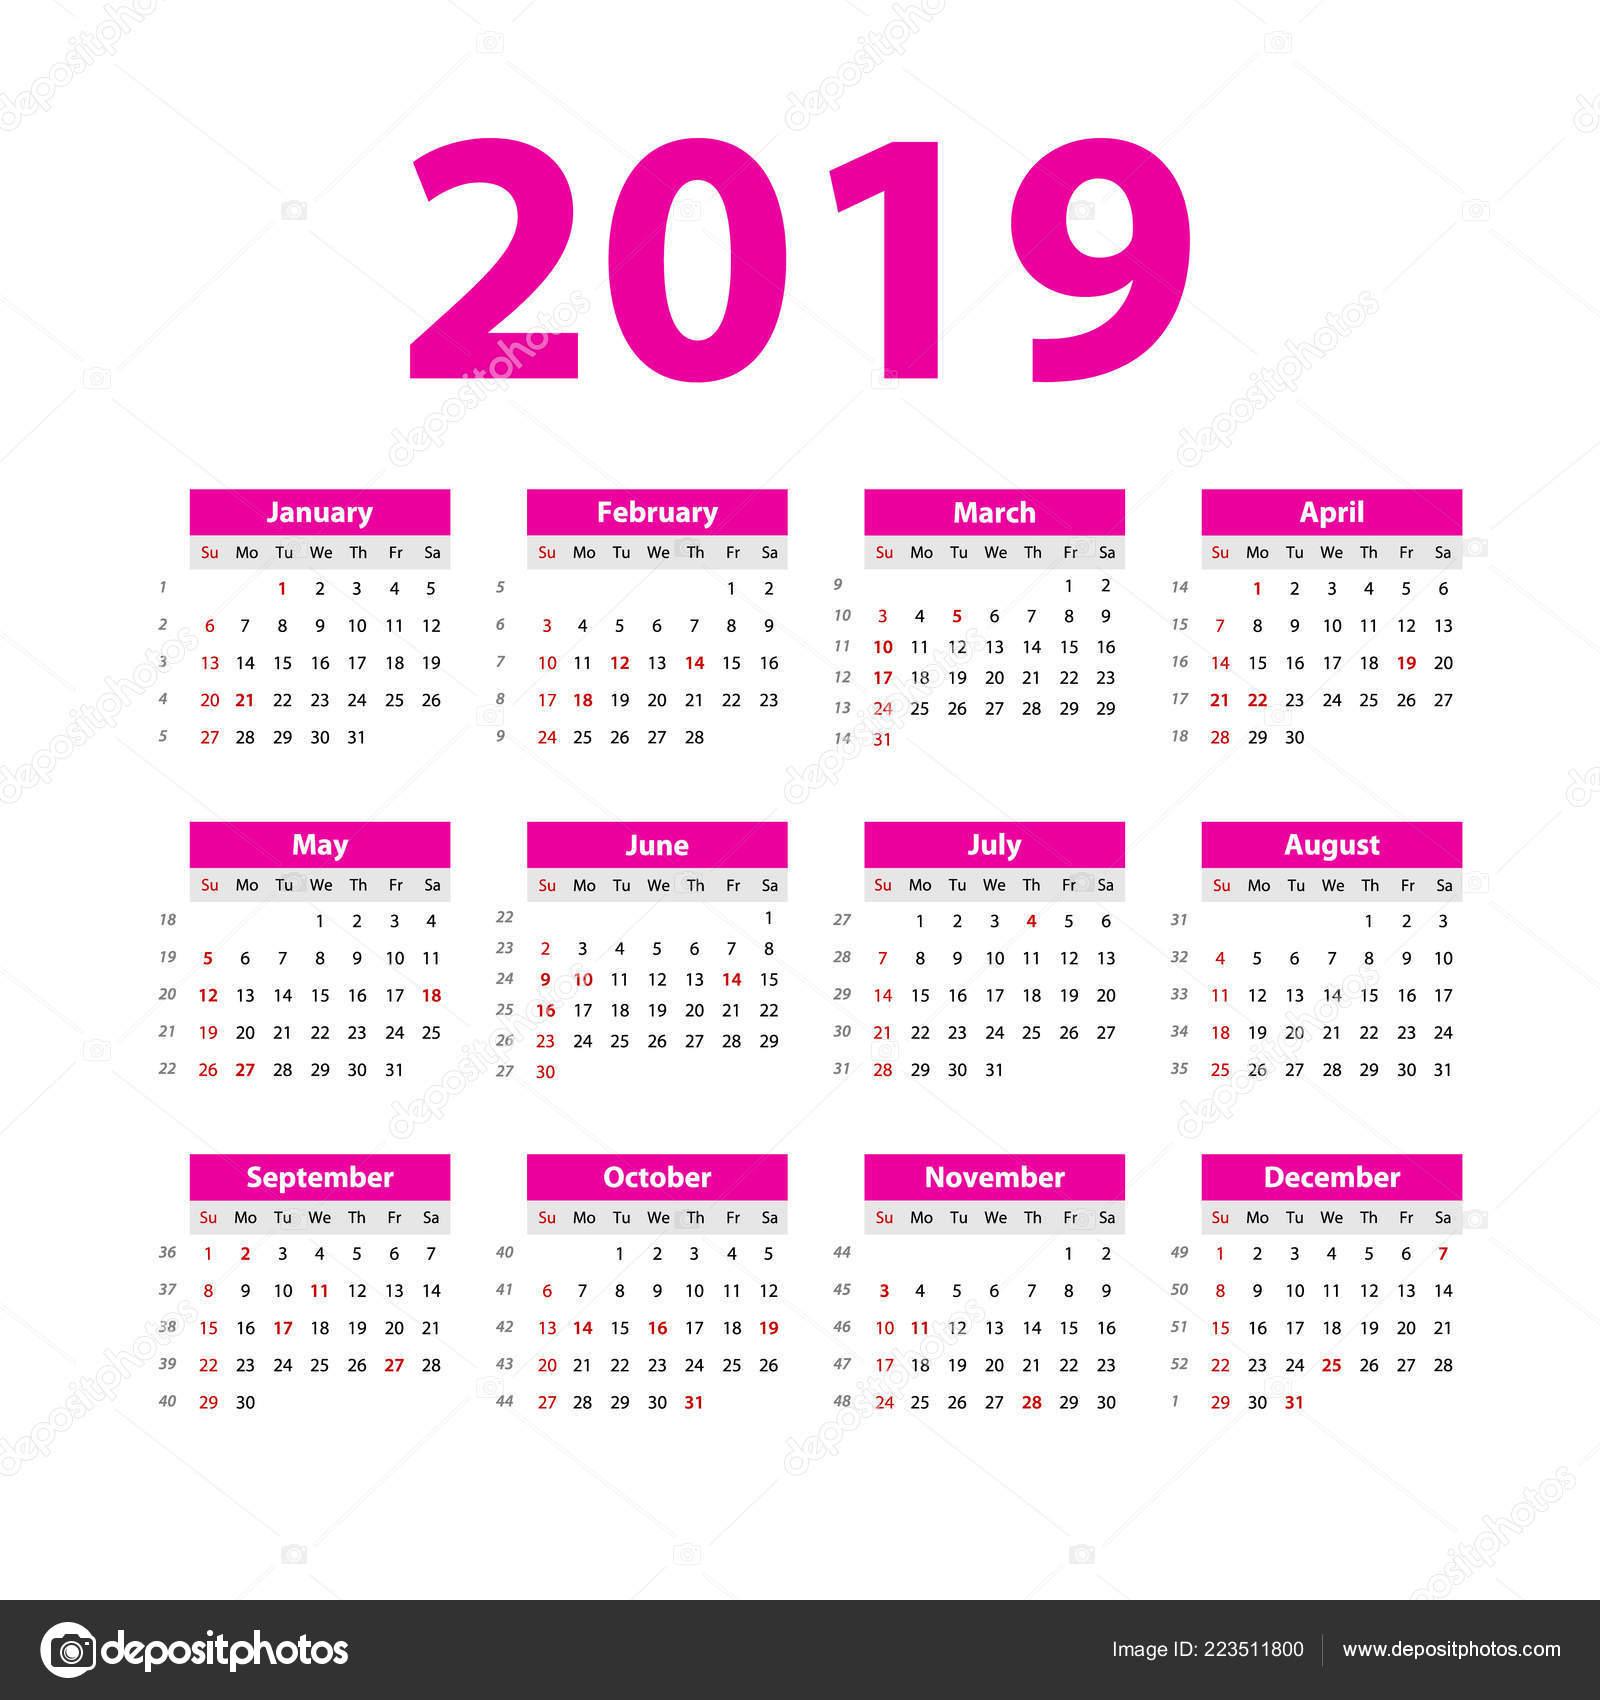 Calendario 2019 Rosa Portugues.Vector Calendario 2019 Color Rosa Semana Comienza Domingo